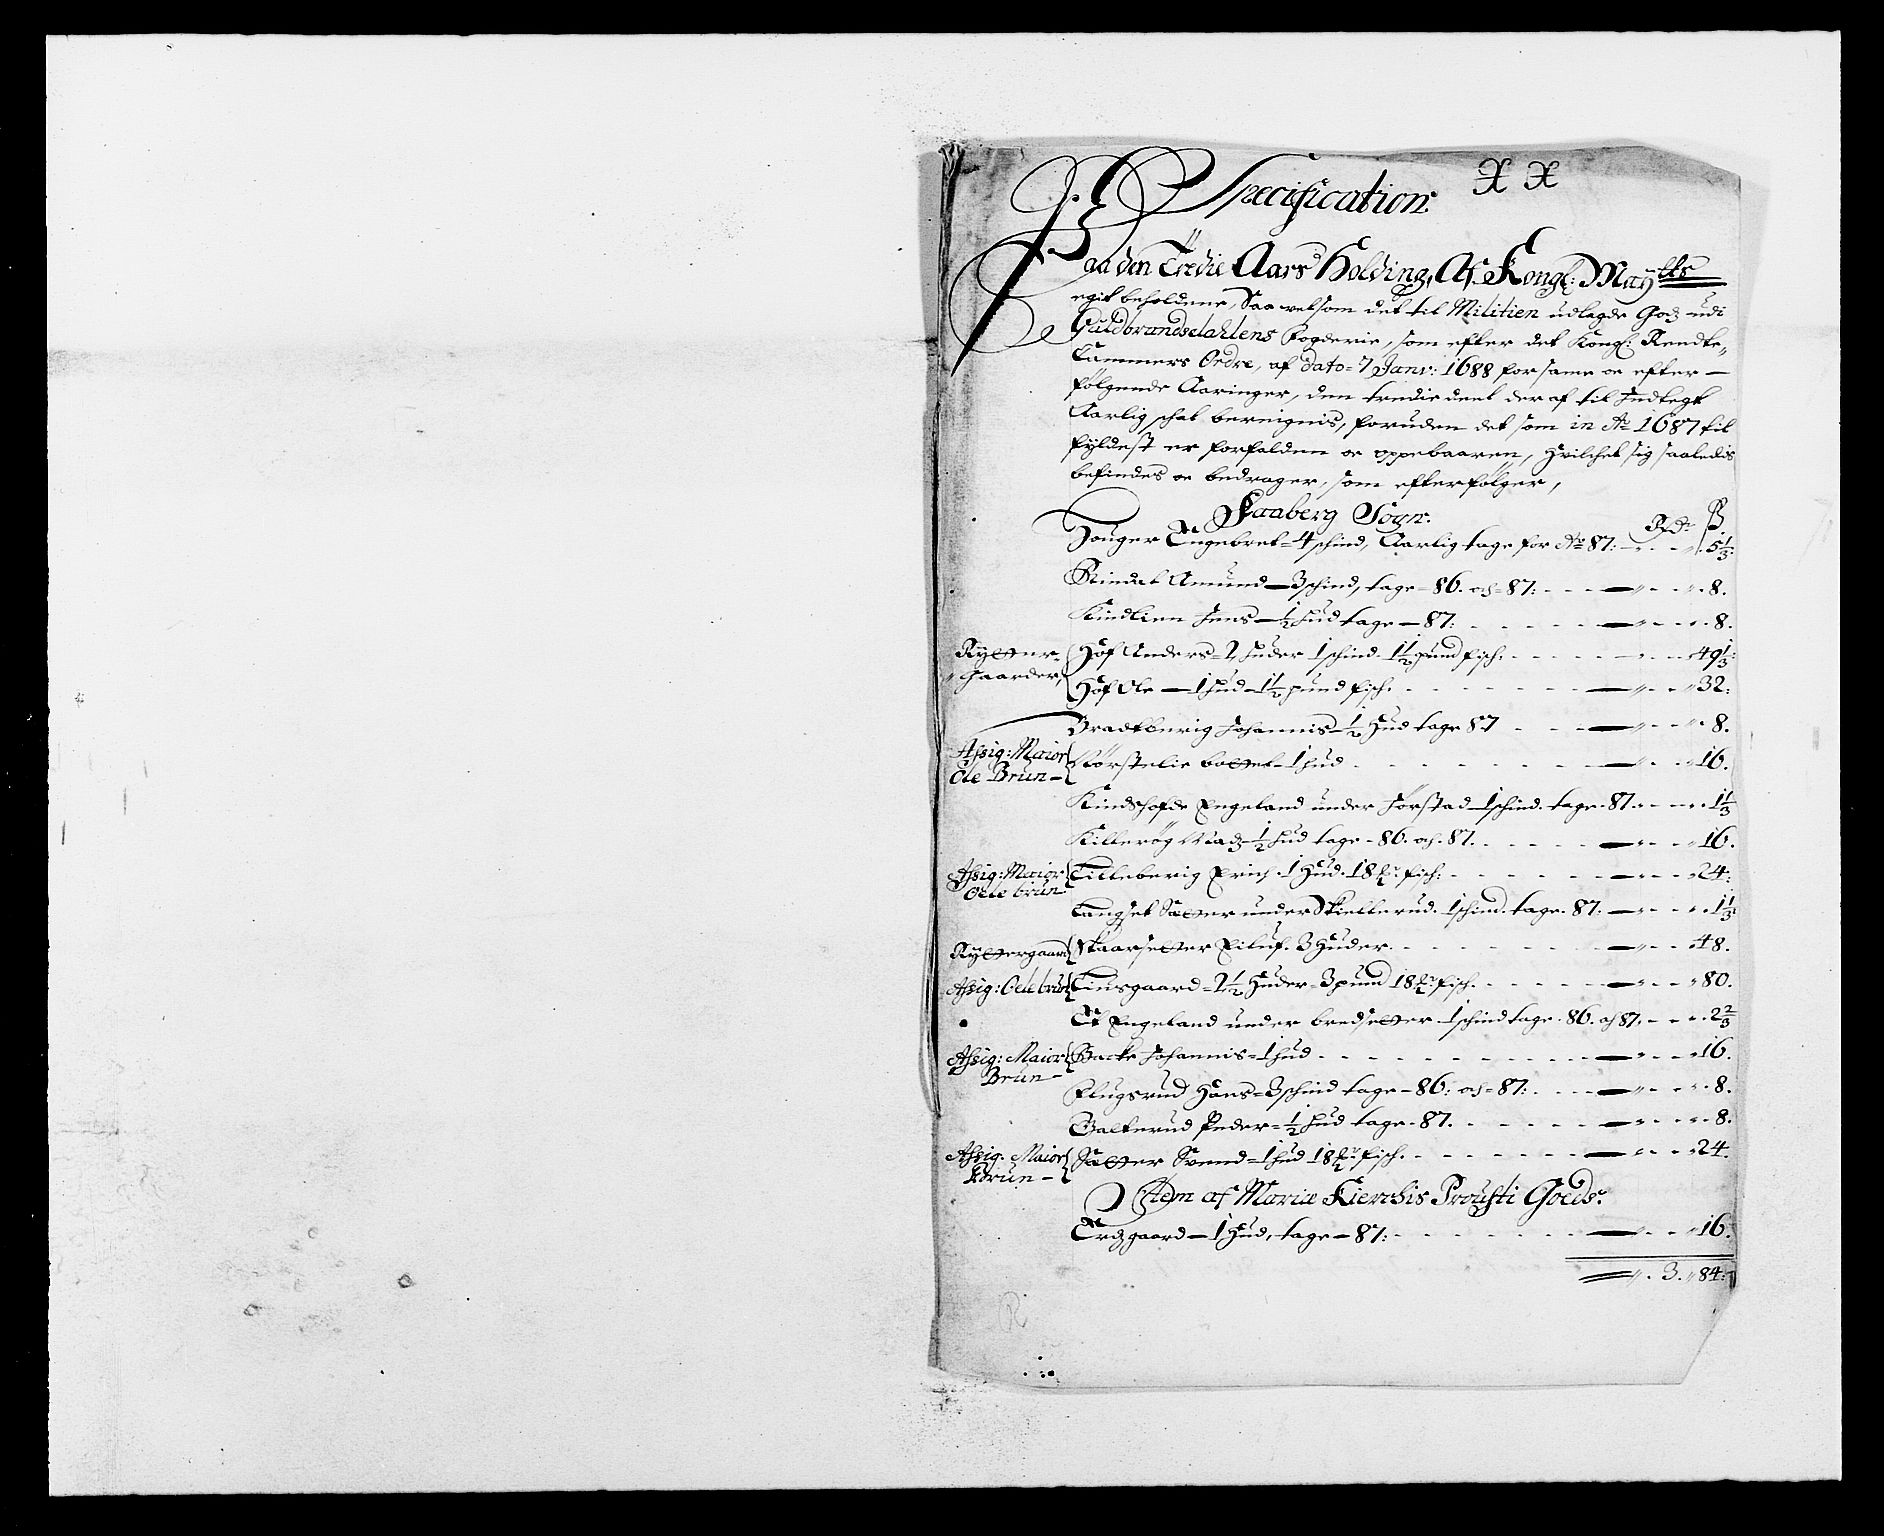 RA, Rentekammeret inntil 1814, Reviderte regnskaper, Fogderegnskap, R17/L1162: Fogderegnskap Gudbrandsdal, 1682-1689, s. 87